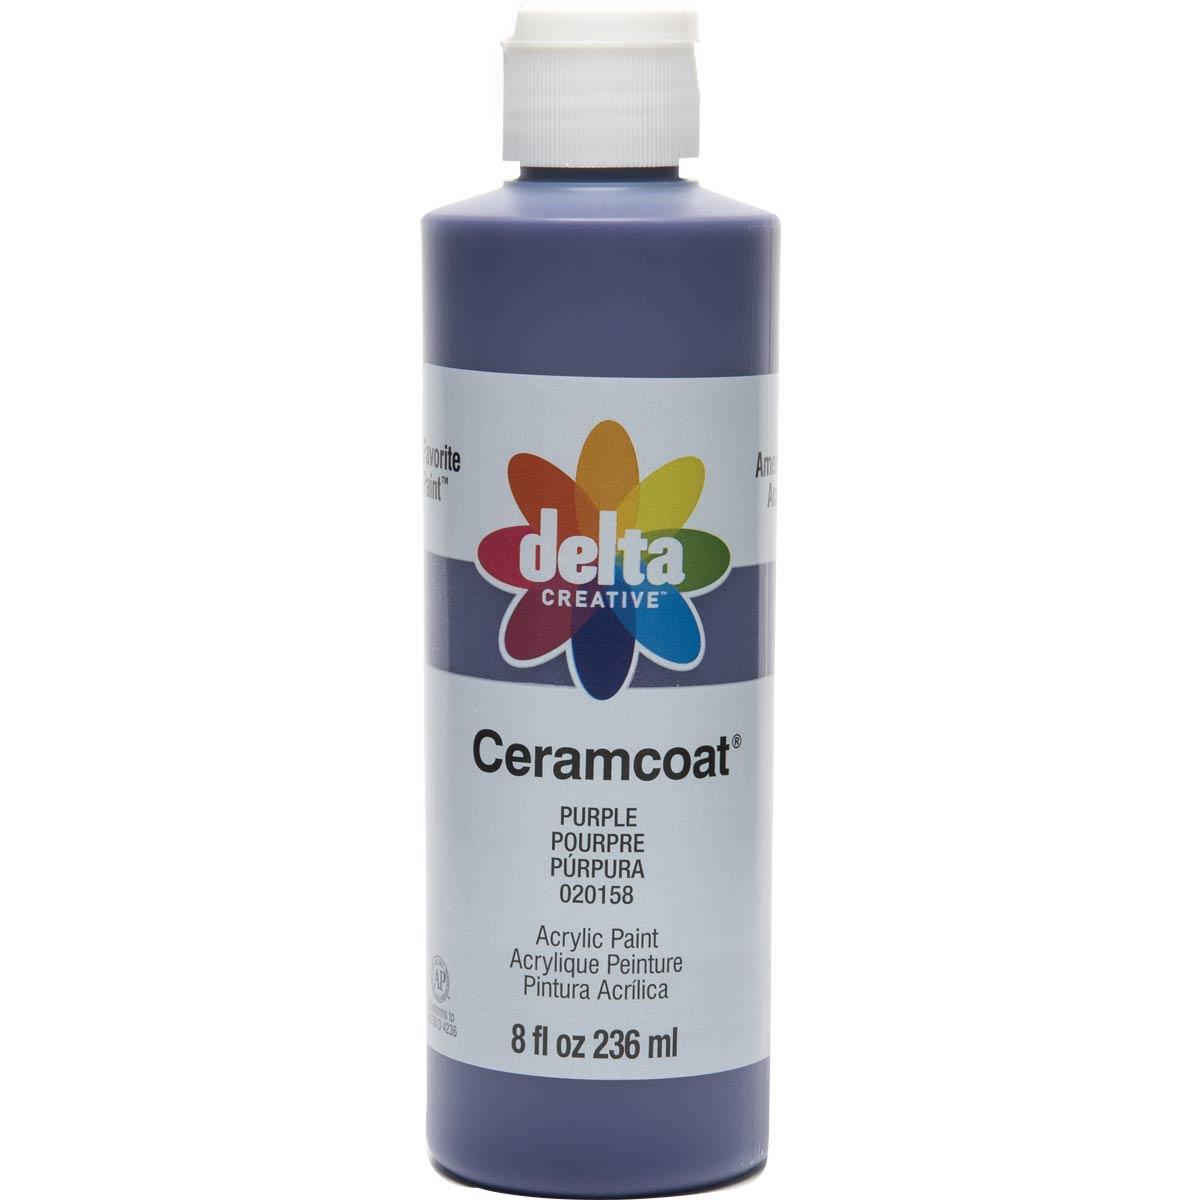 Delta Ceramcoat ® Acrylic Paint - Purple, 8 oz.